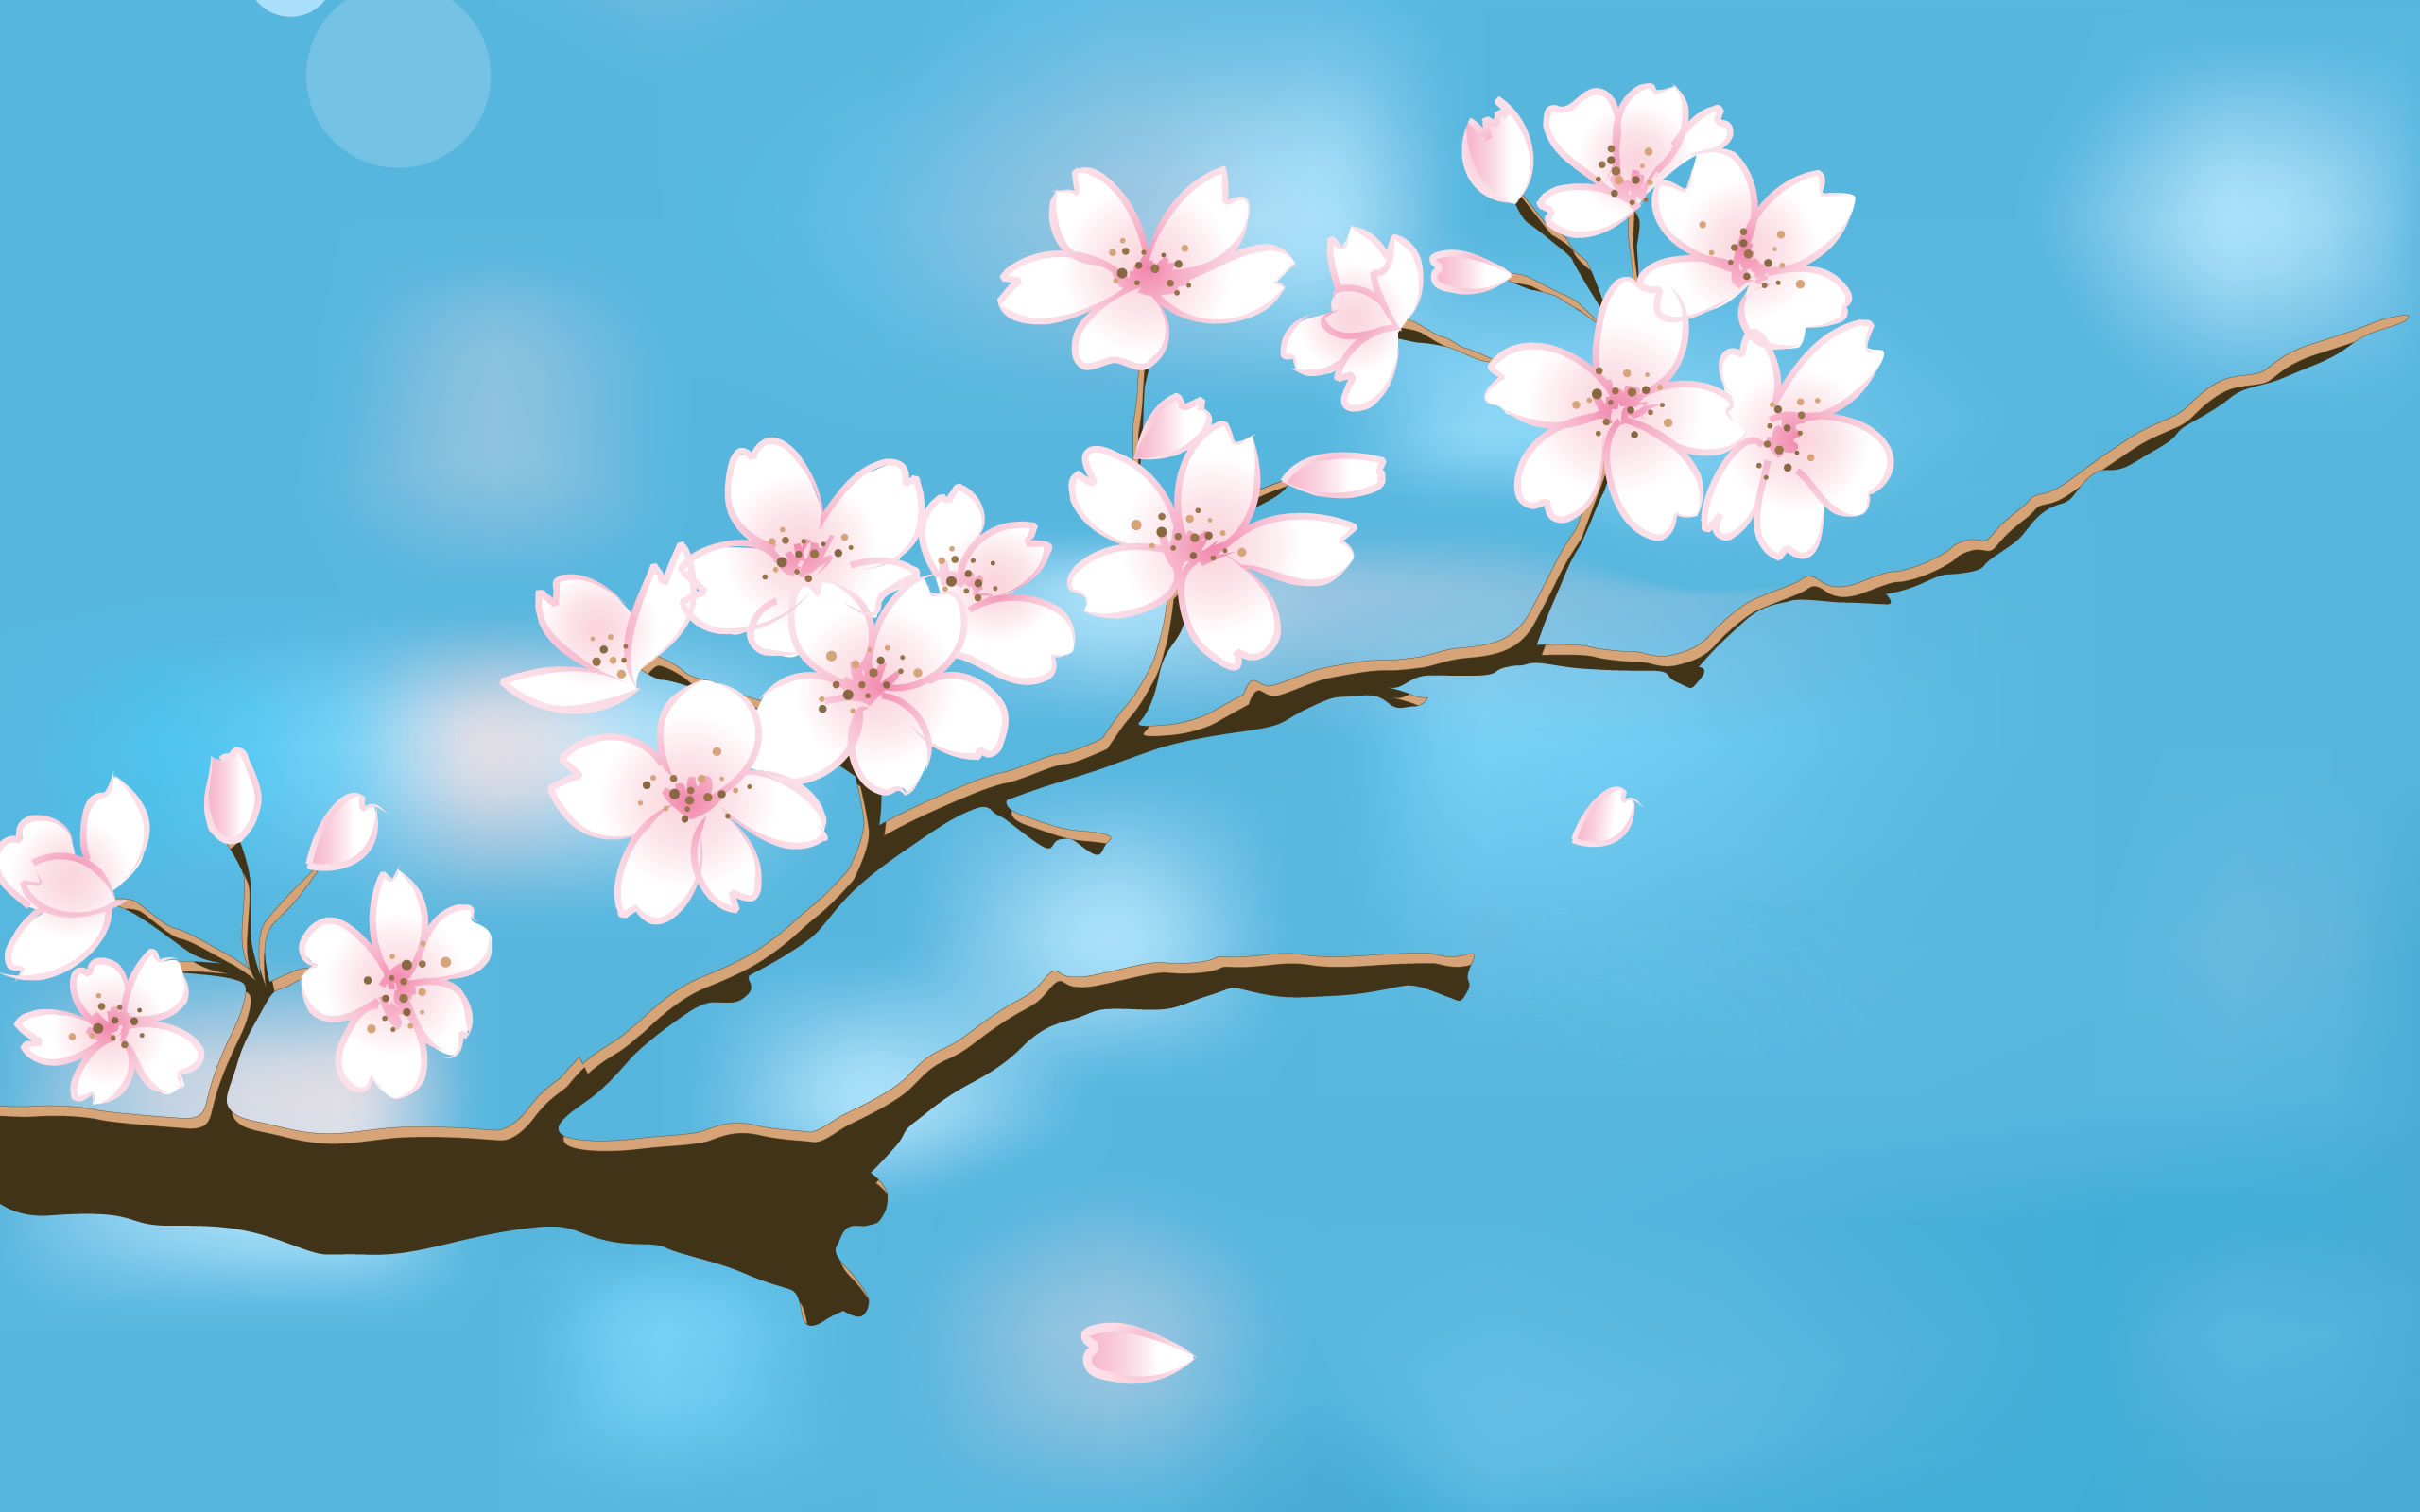 Spring background download 2560x1600